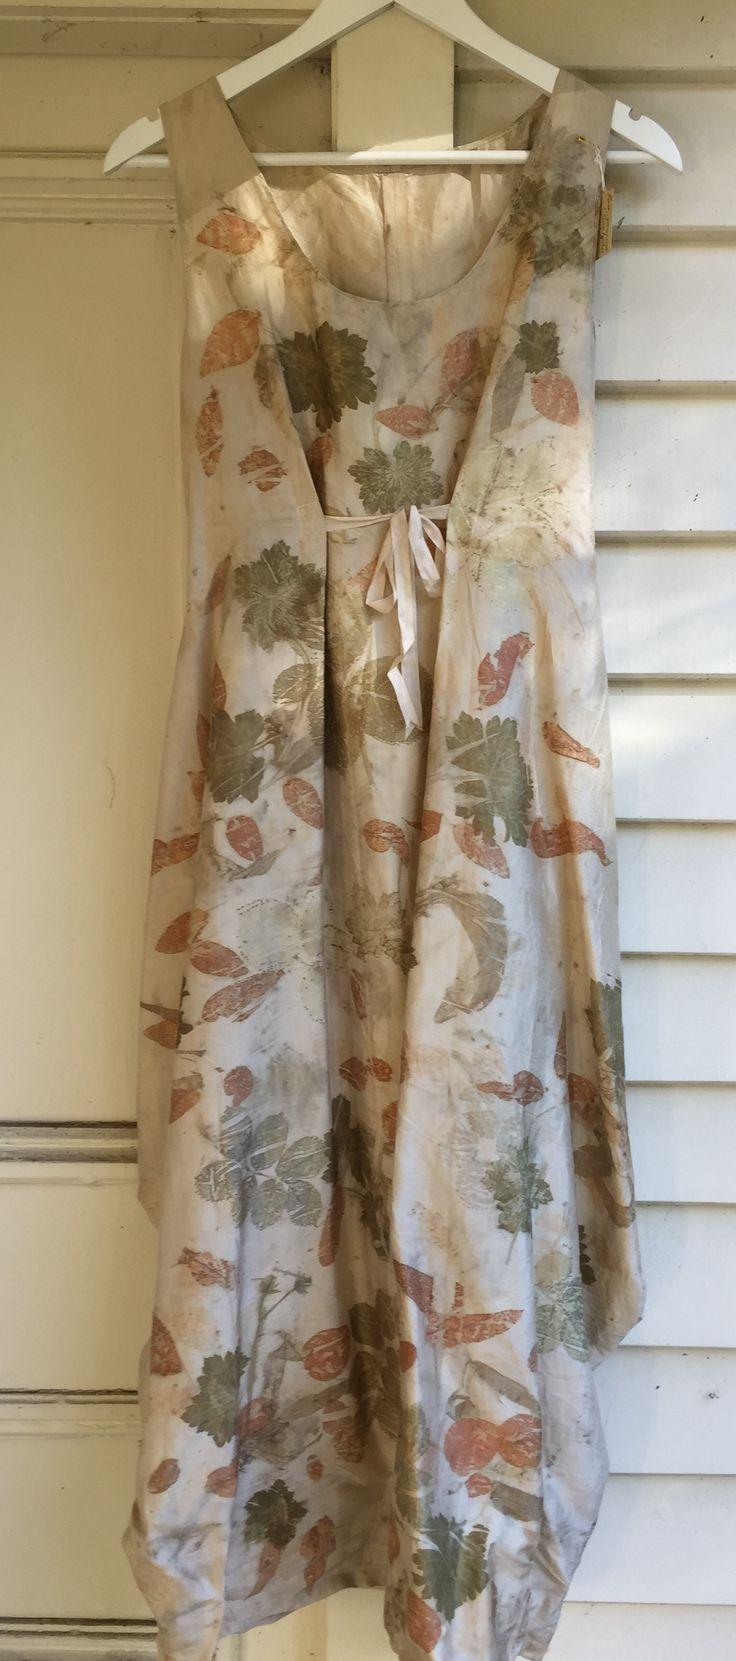 Dupion silk with rose, eucalyptus and geranium leaf prints